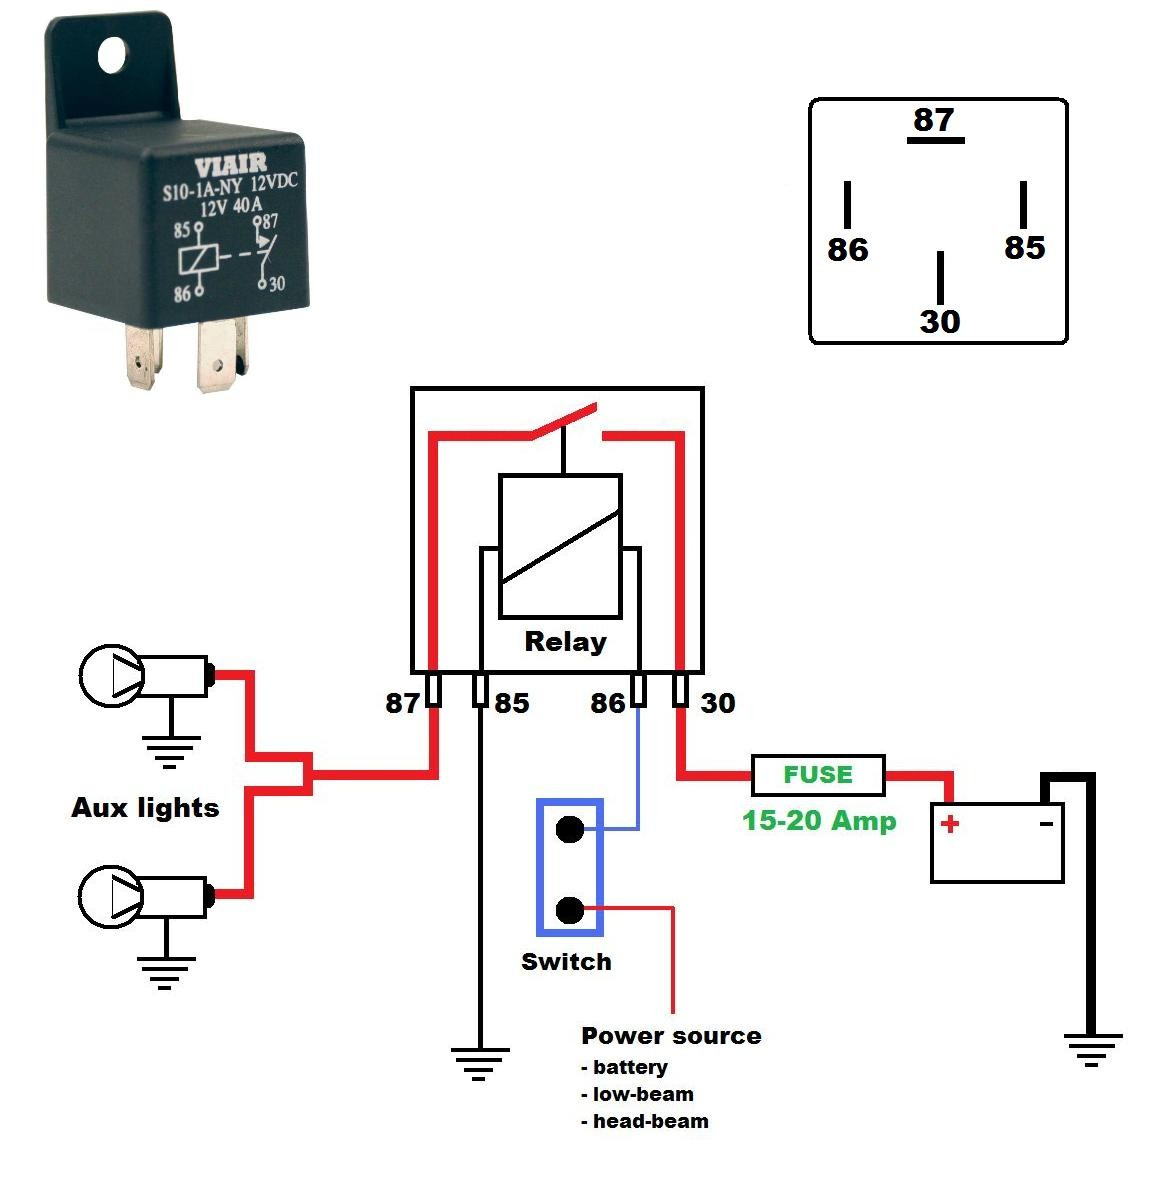 Rib Wiring Diagram | Wiring Library - Rib Relay Wiring Diagram